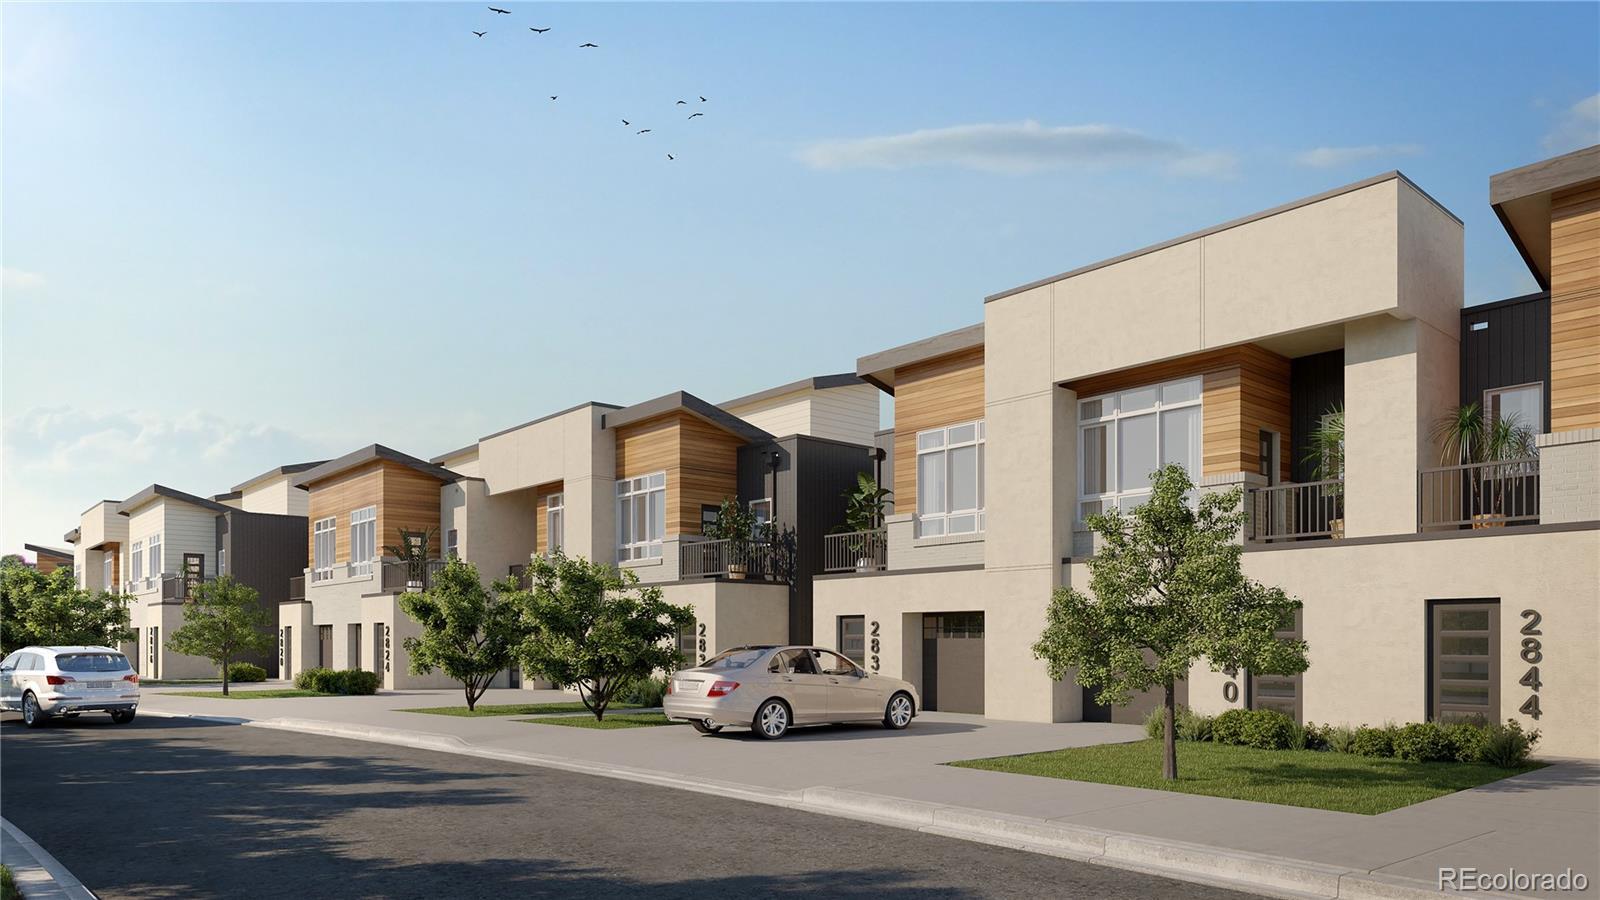 2812 W 53rd Avenue Property Photo - Denver, CO real estate listing